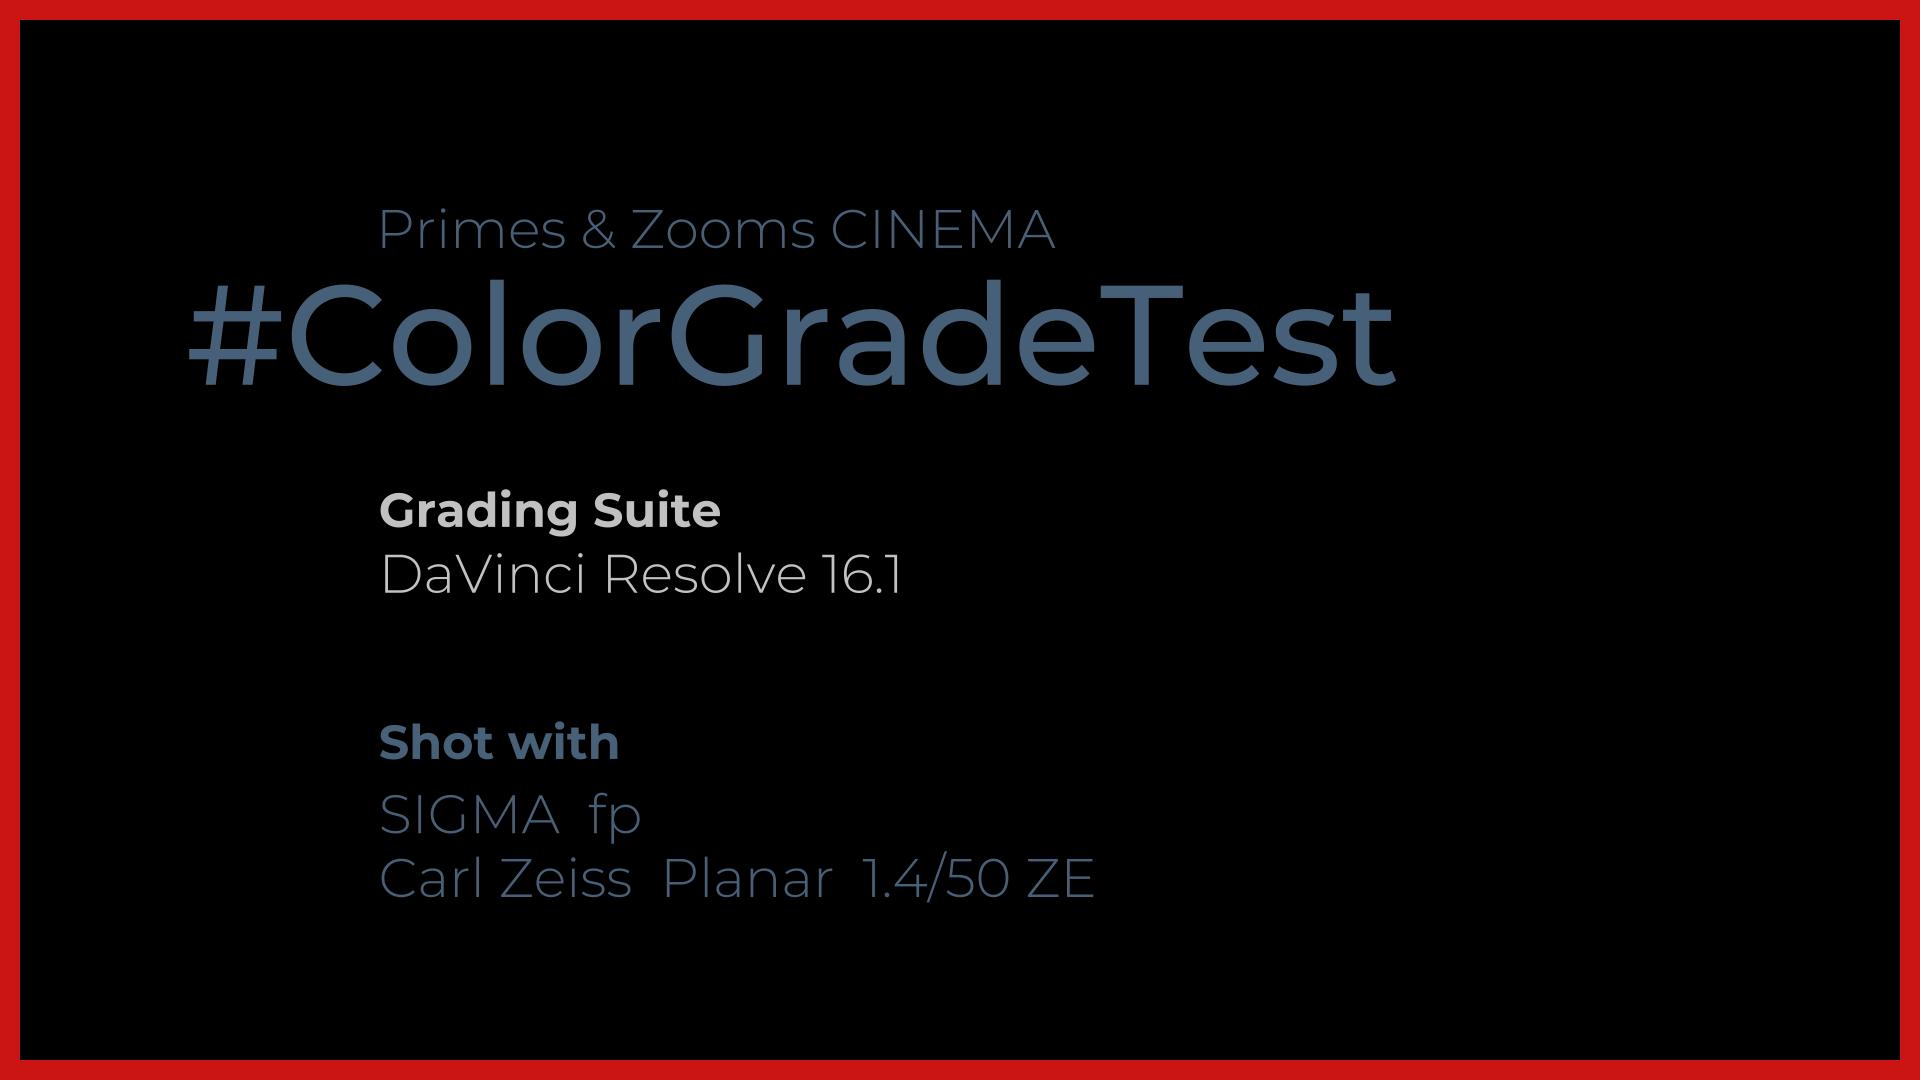 Grade Test: Bob & Co